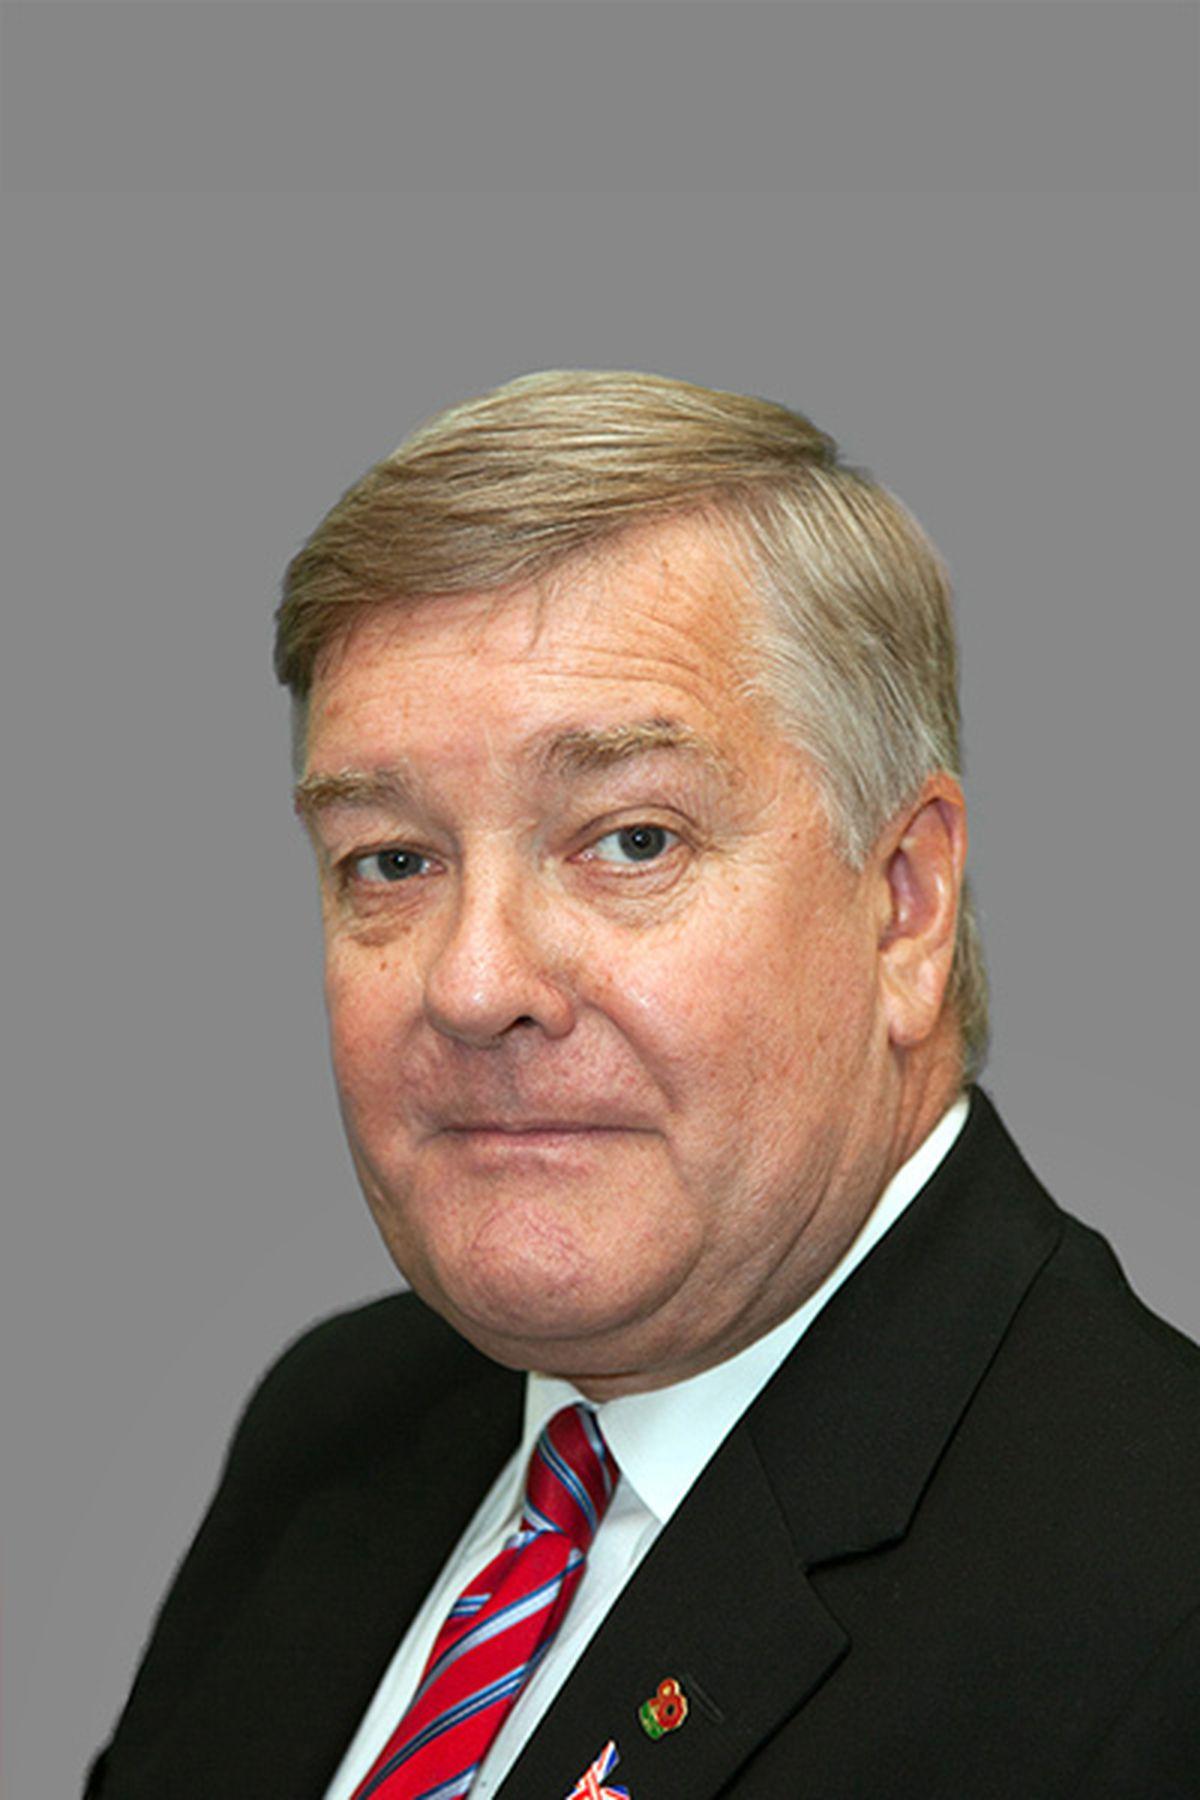 Councillor Jones